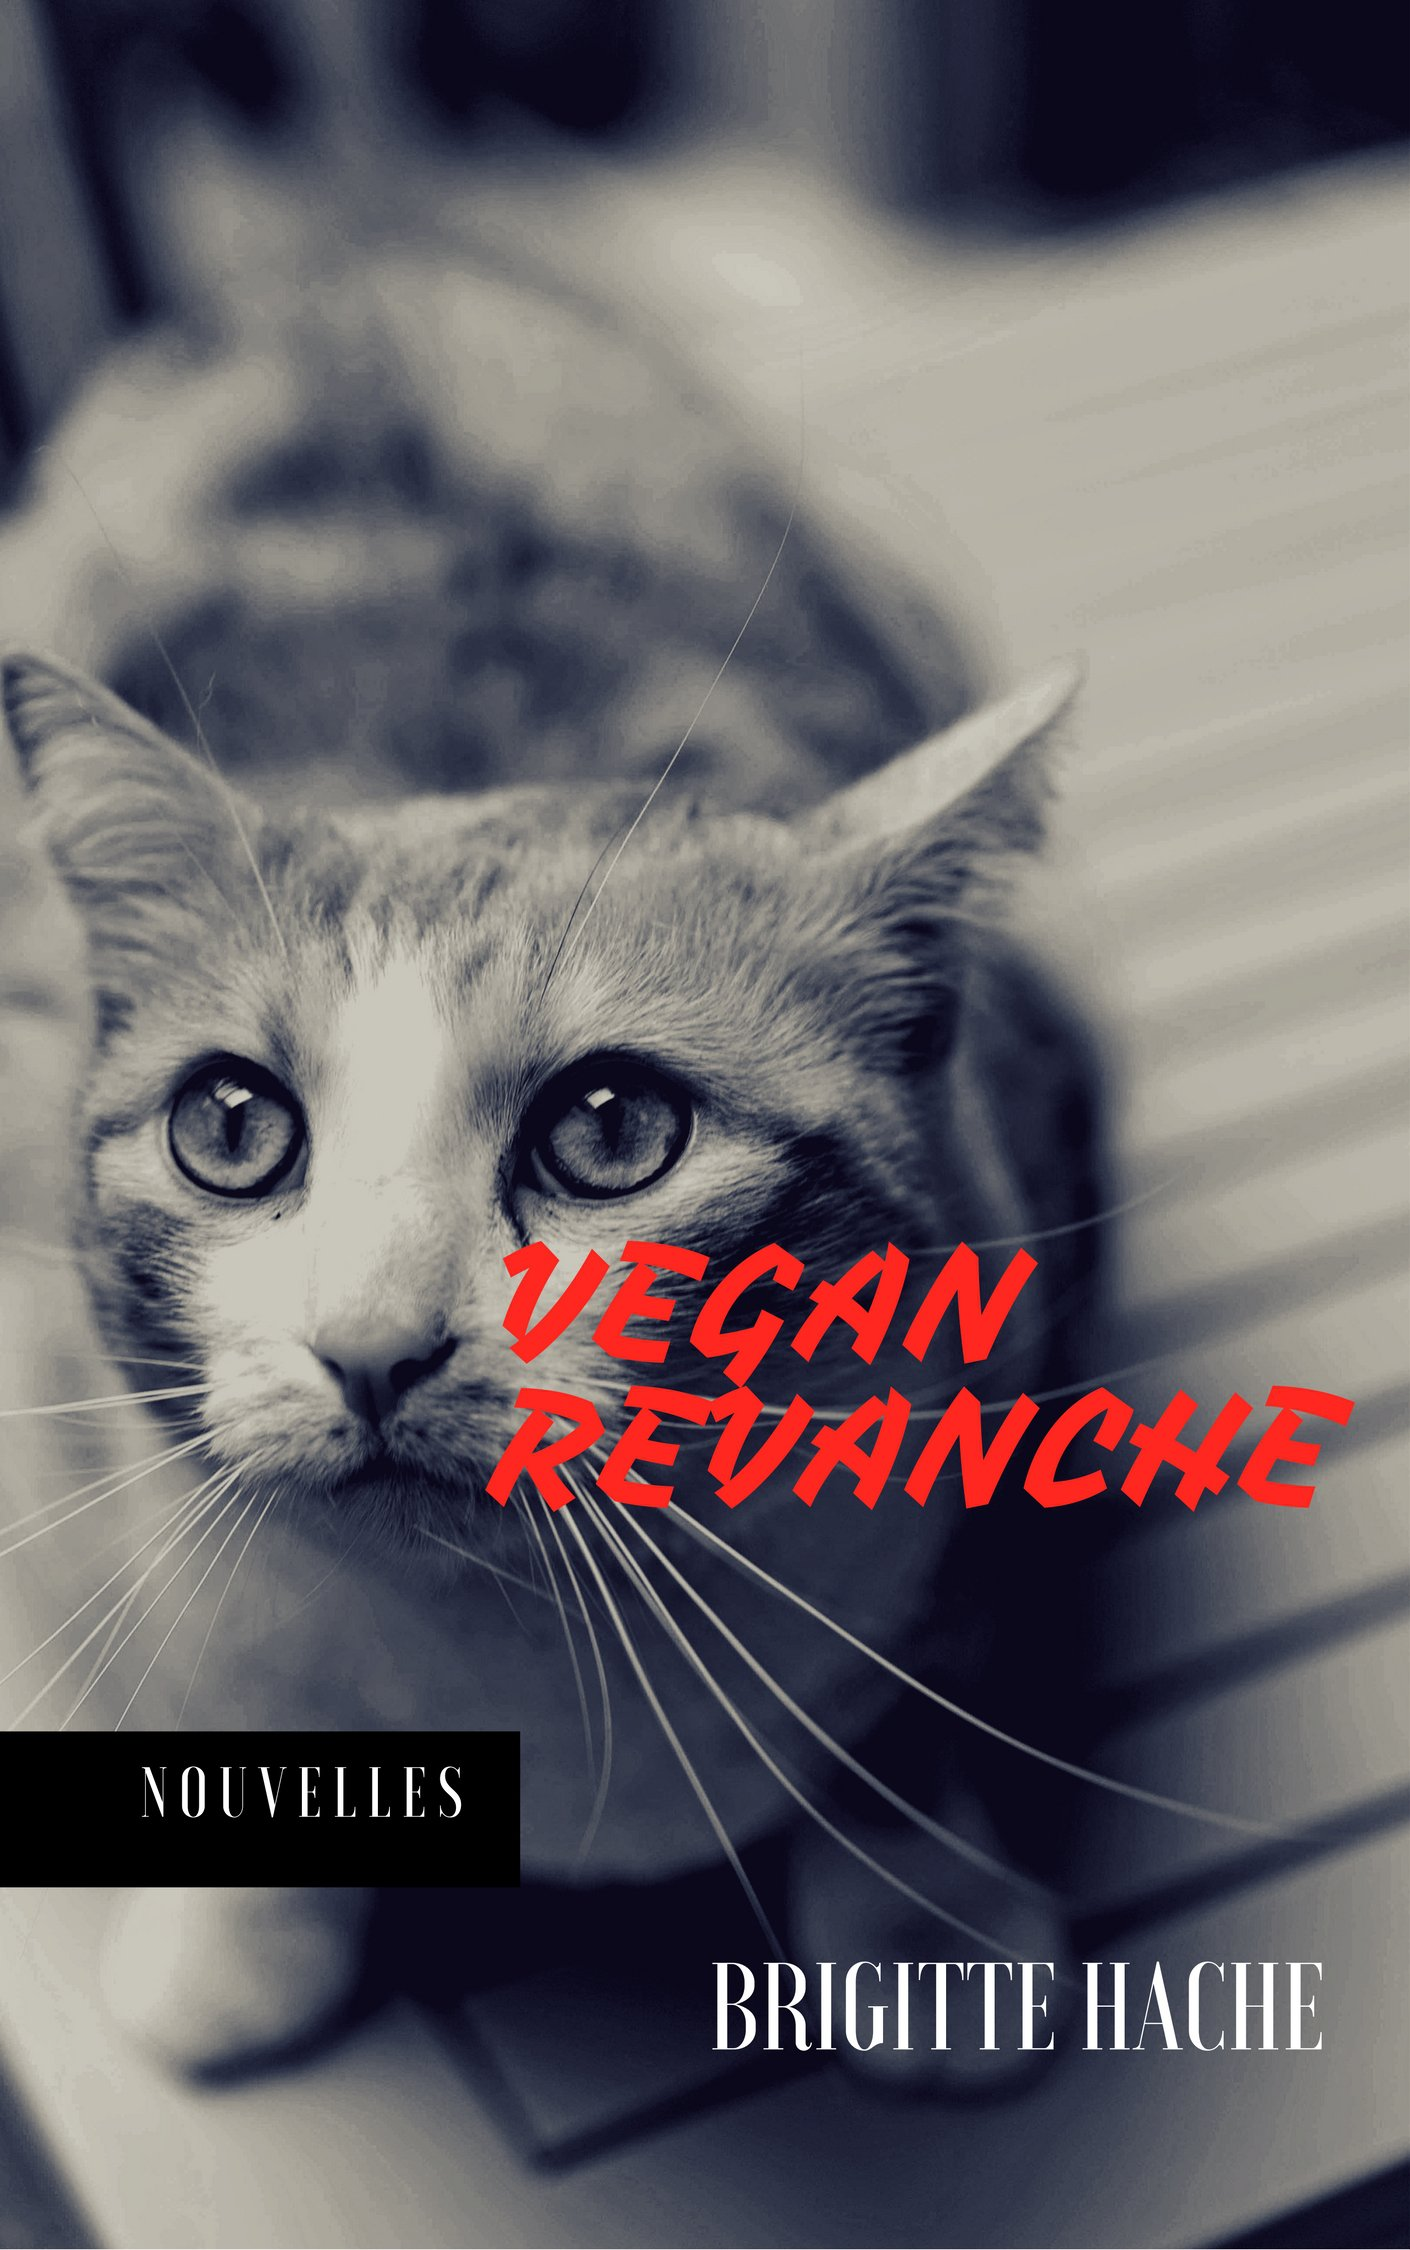 Vegan Revanche Brigitte Hache